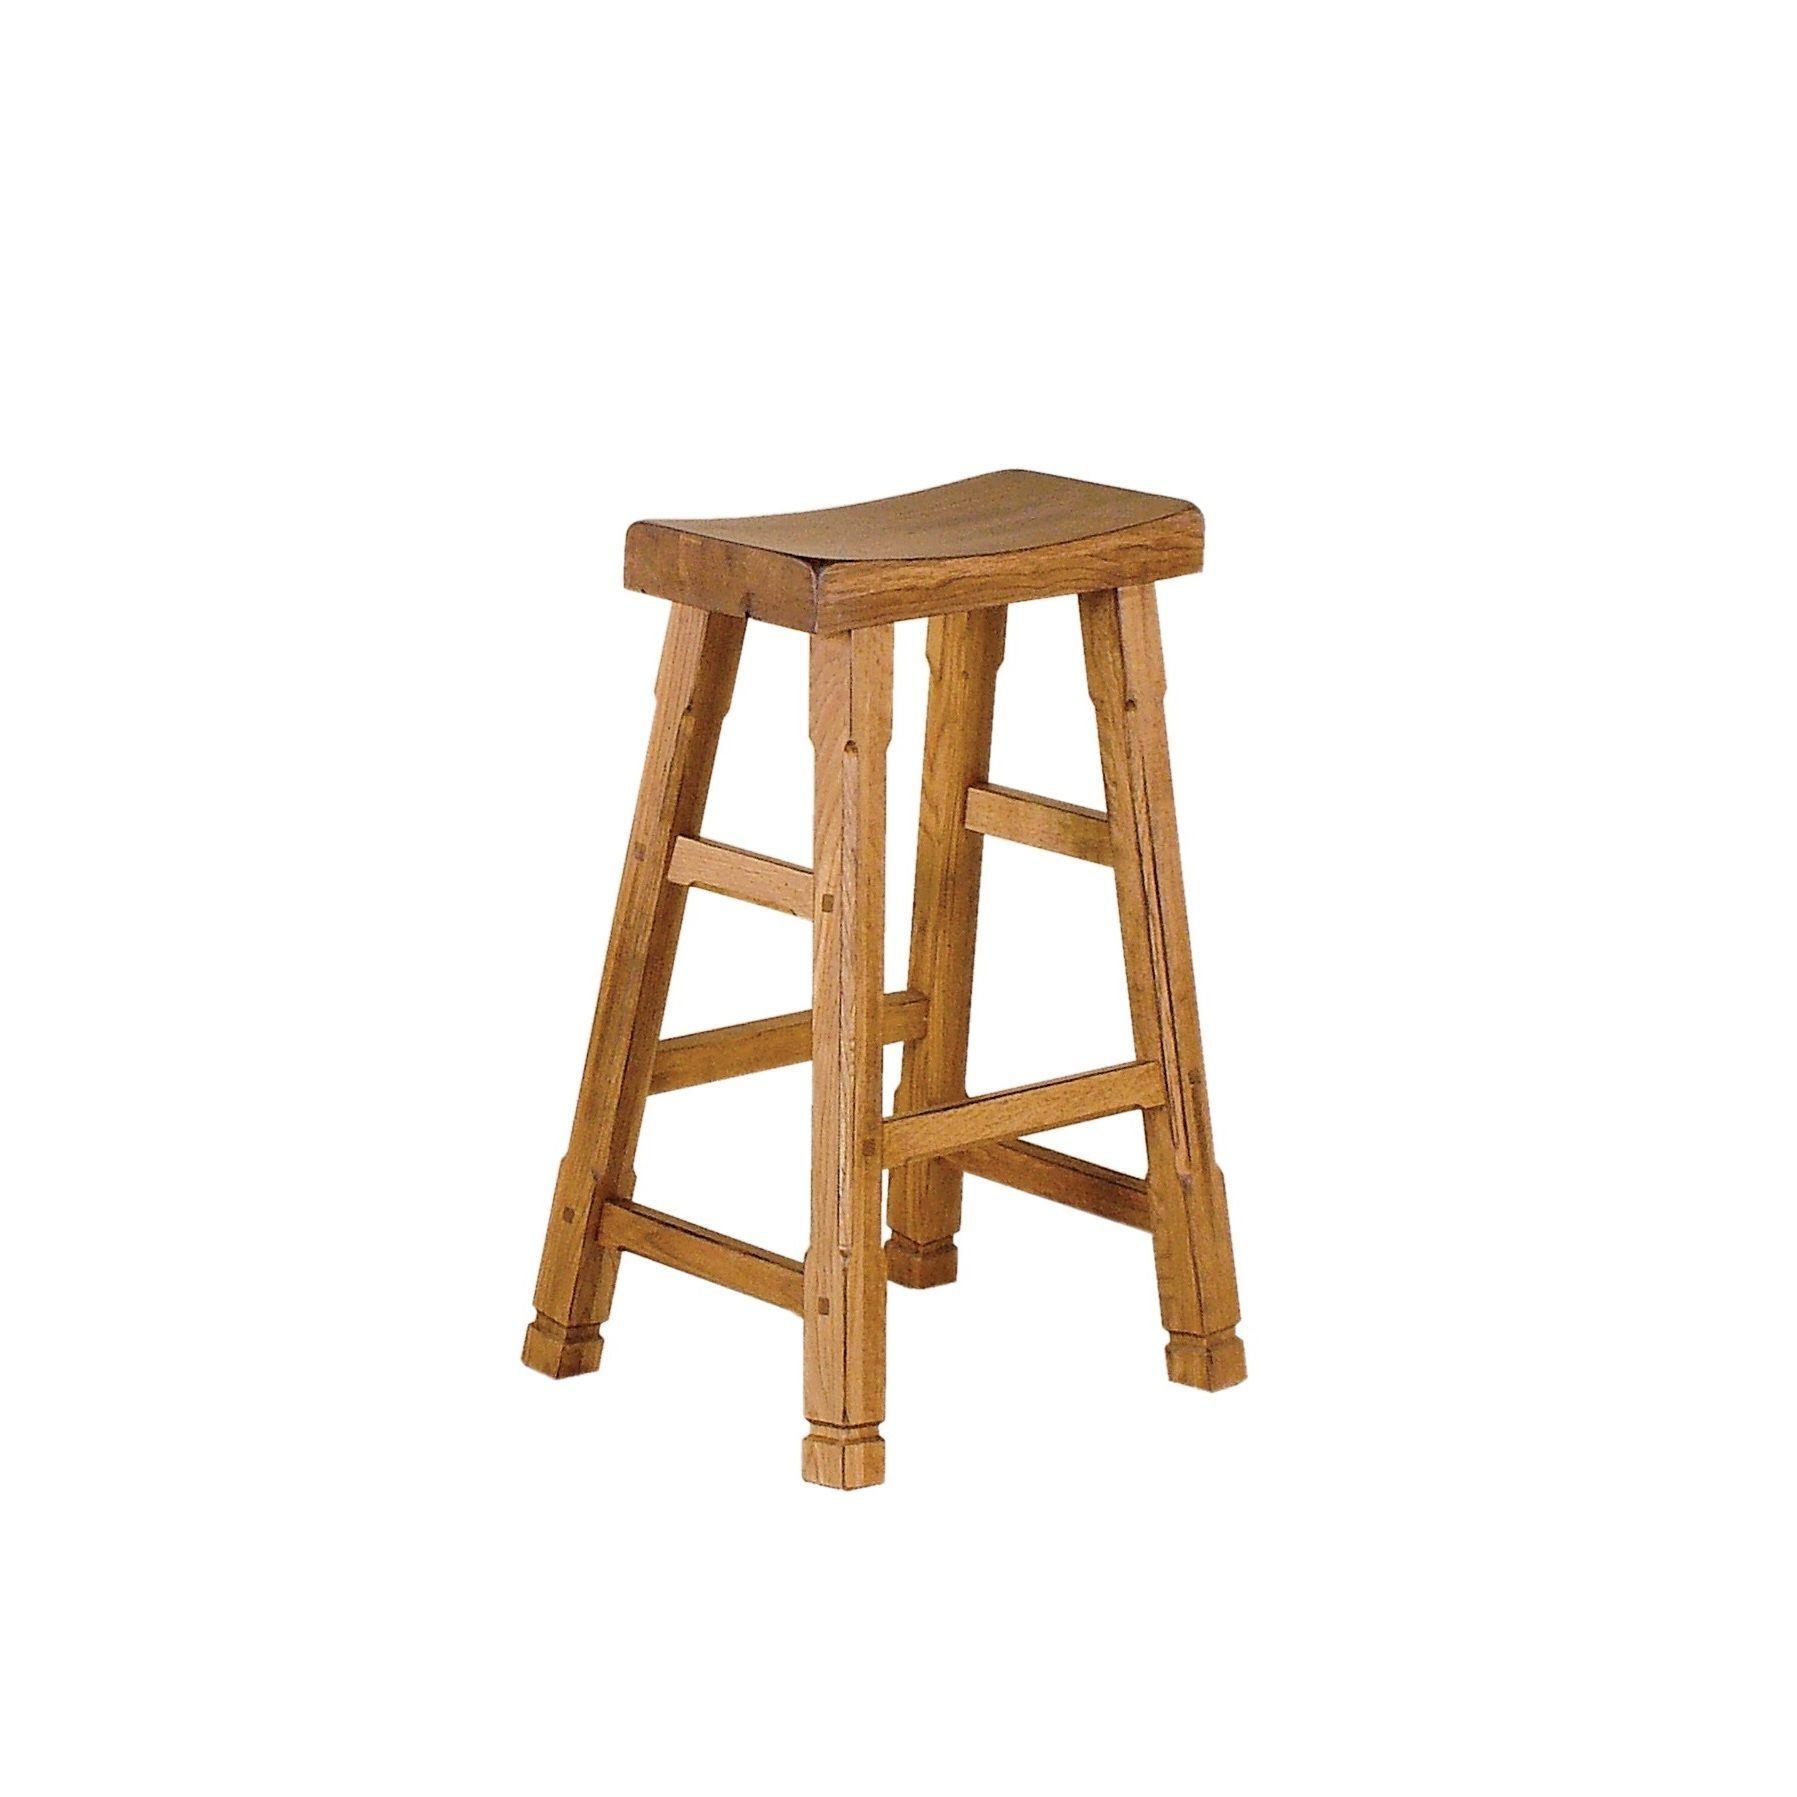 Sunny Designs Sedona 30 Inch Saddle Seat Bar Stool Rustic Oak Tan Mdf